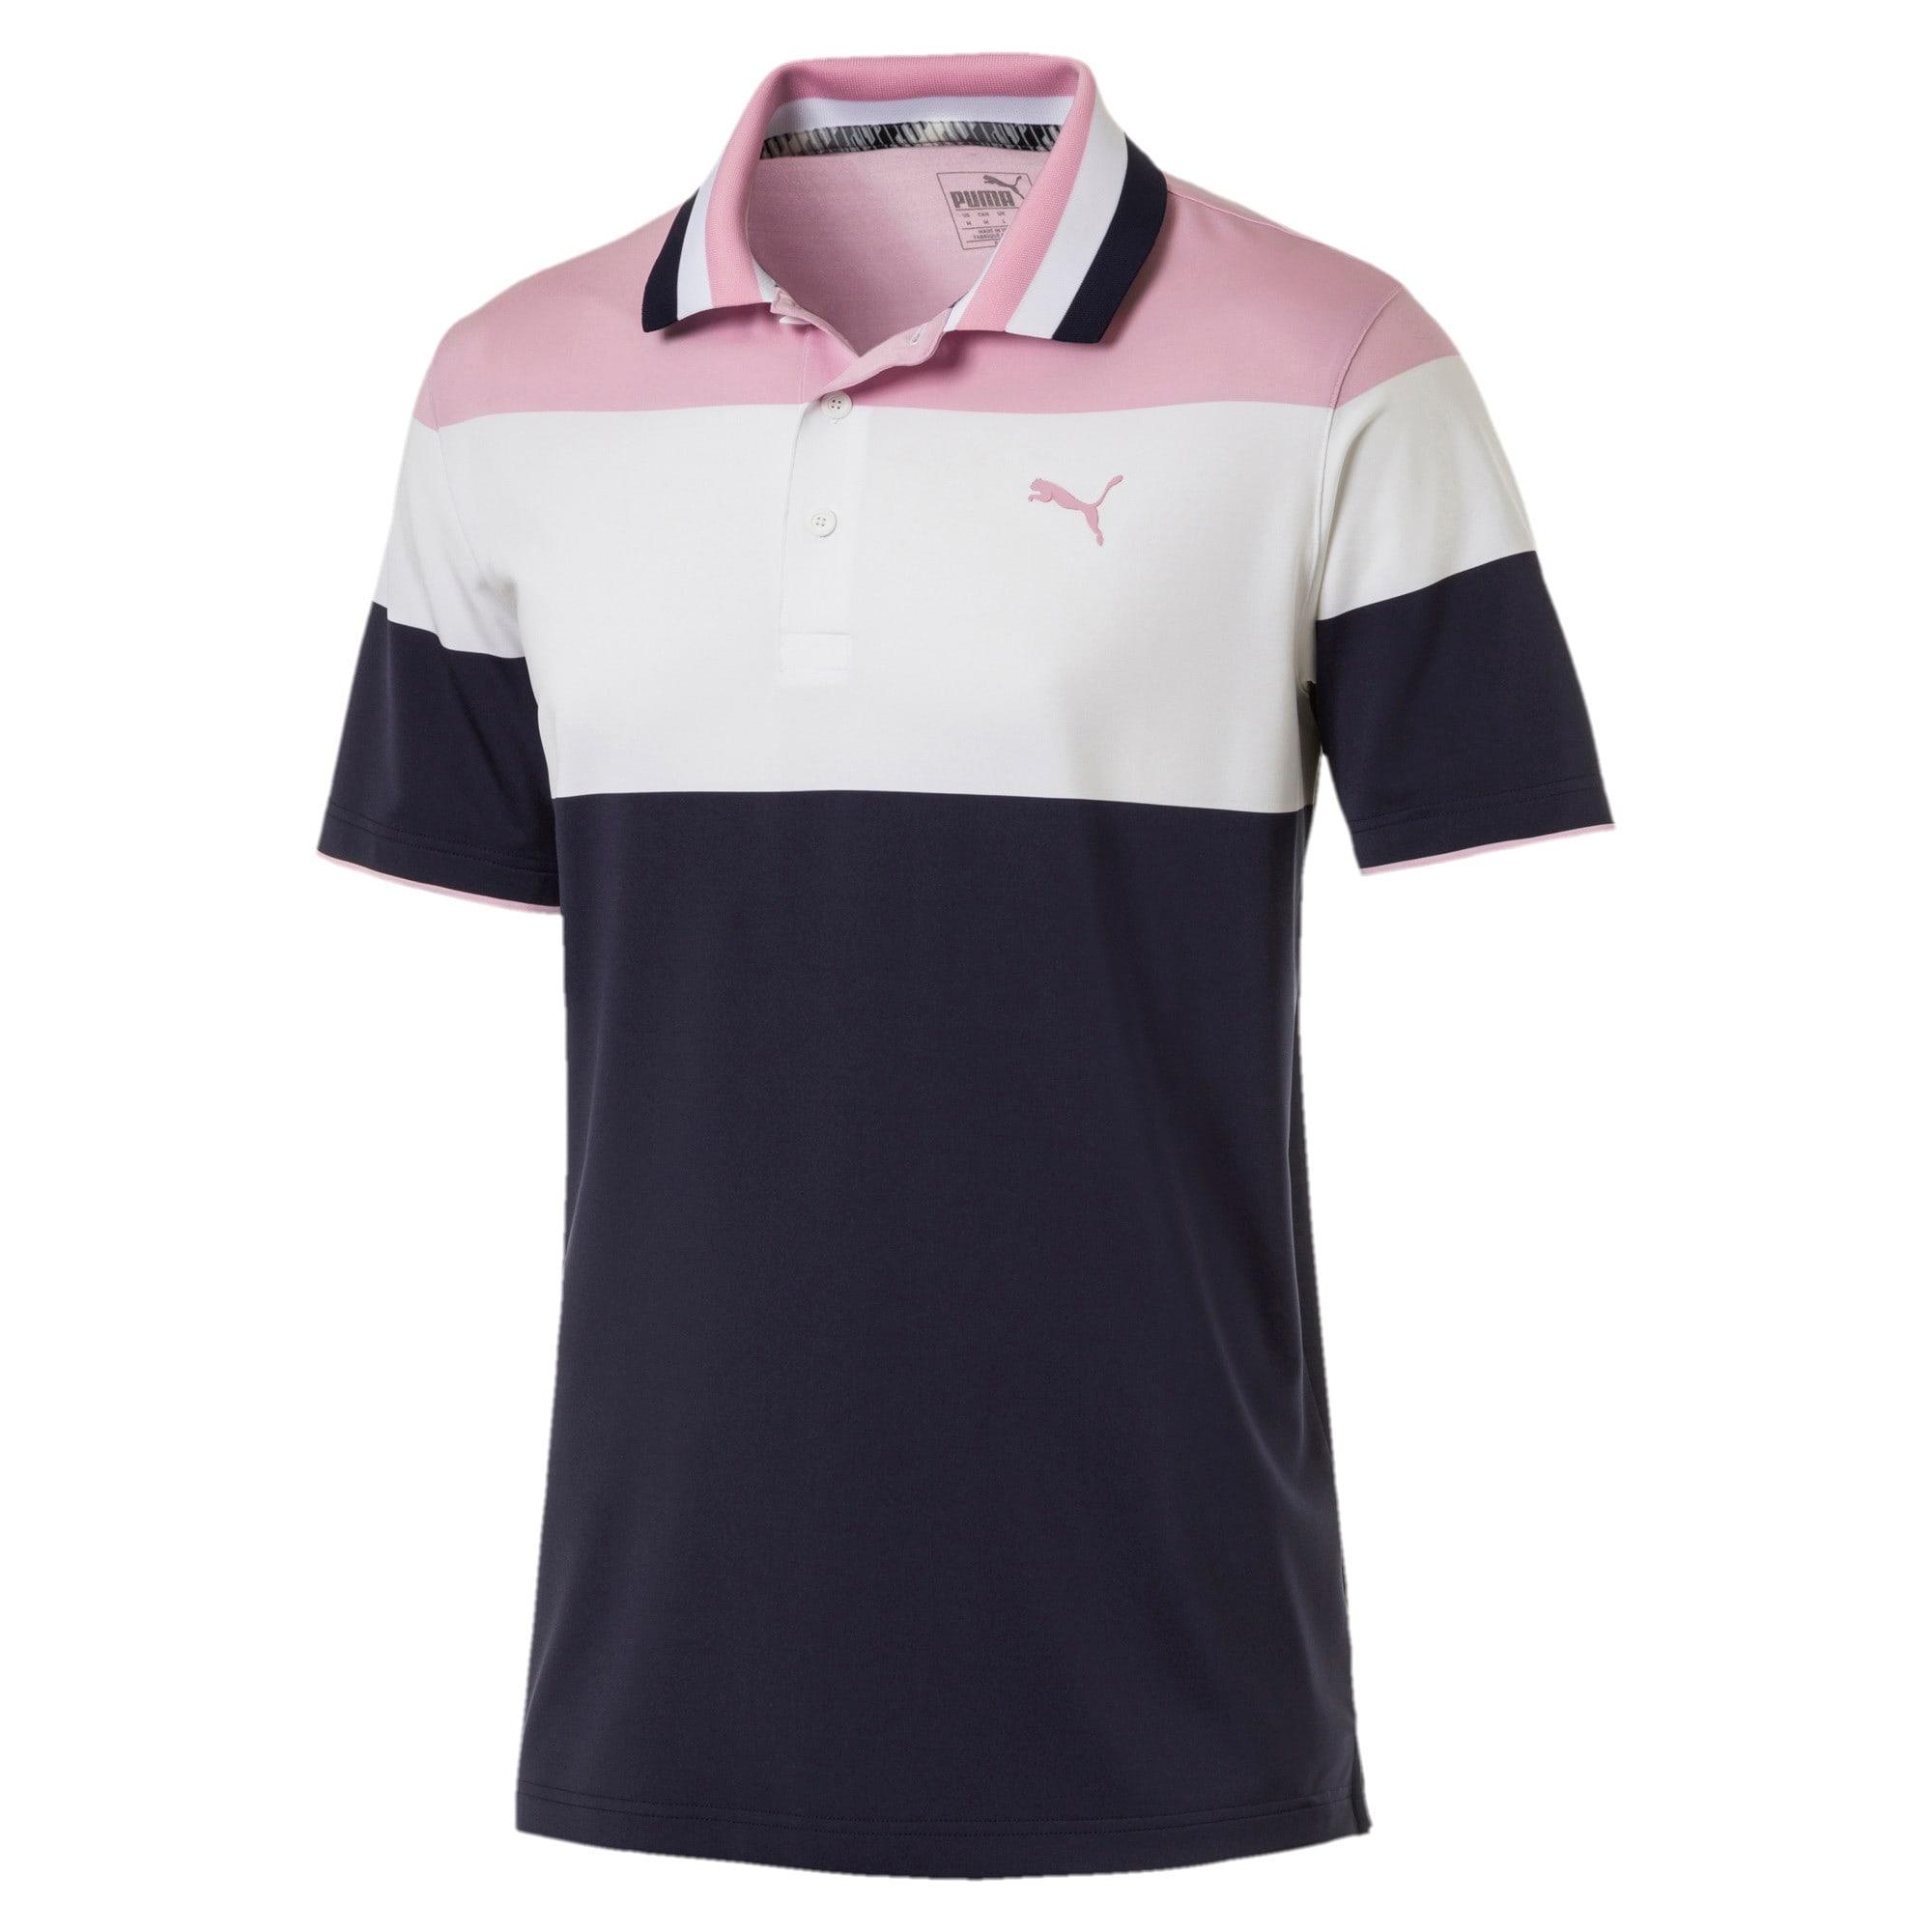 Thumbnail 4 of Nineties Men's Golf Polo, Pale Pink, medium